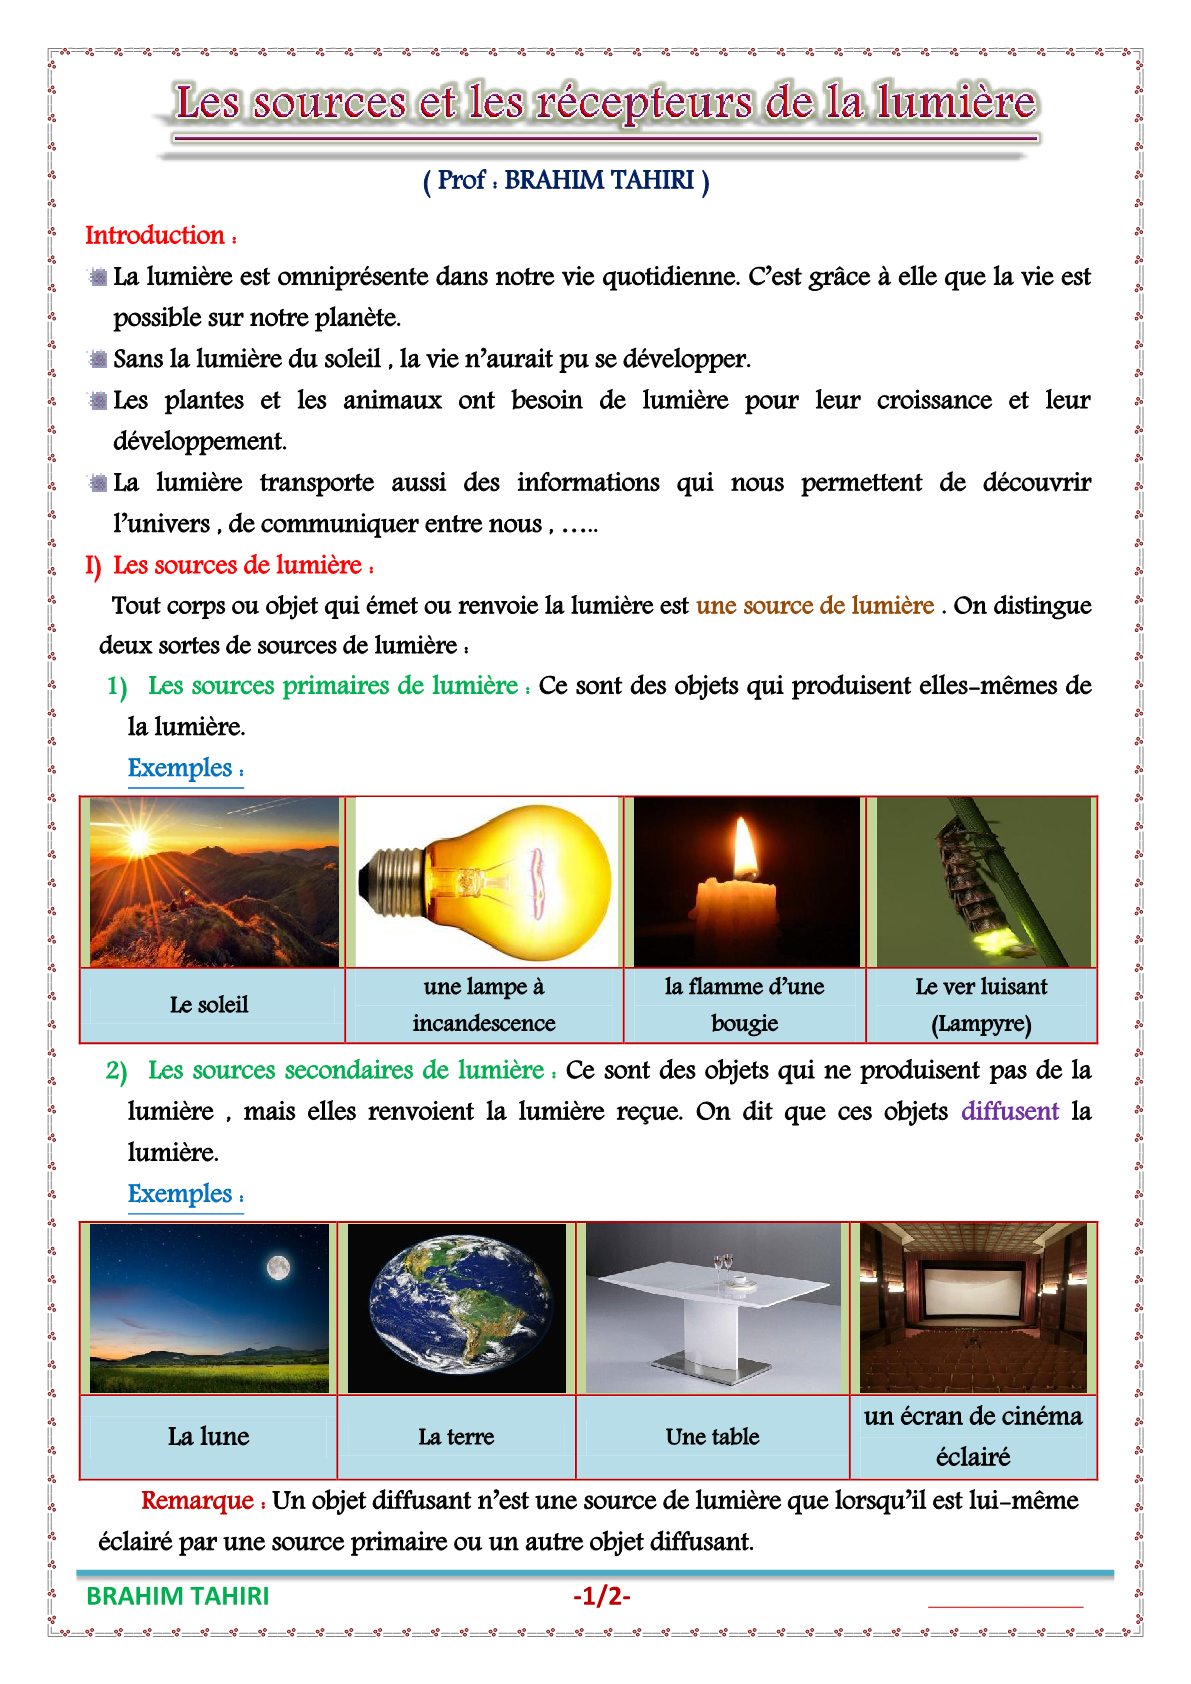 درس Les sources et les récepteurs de la lumière للسنة الثانية اعدادي